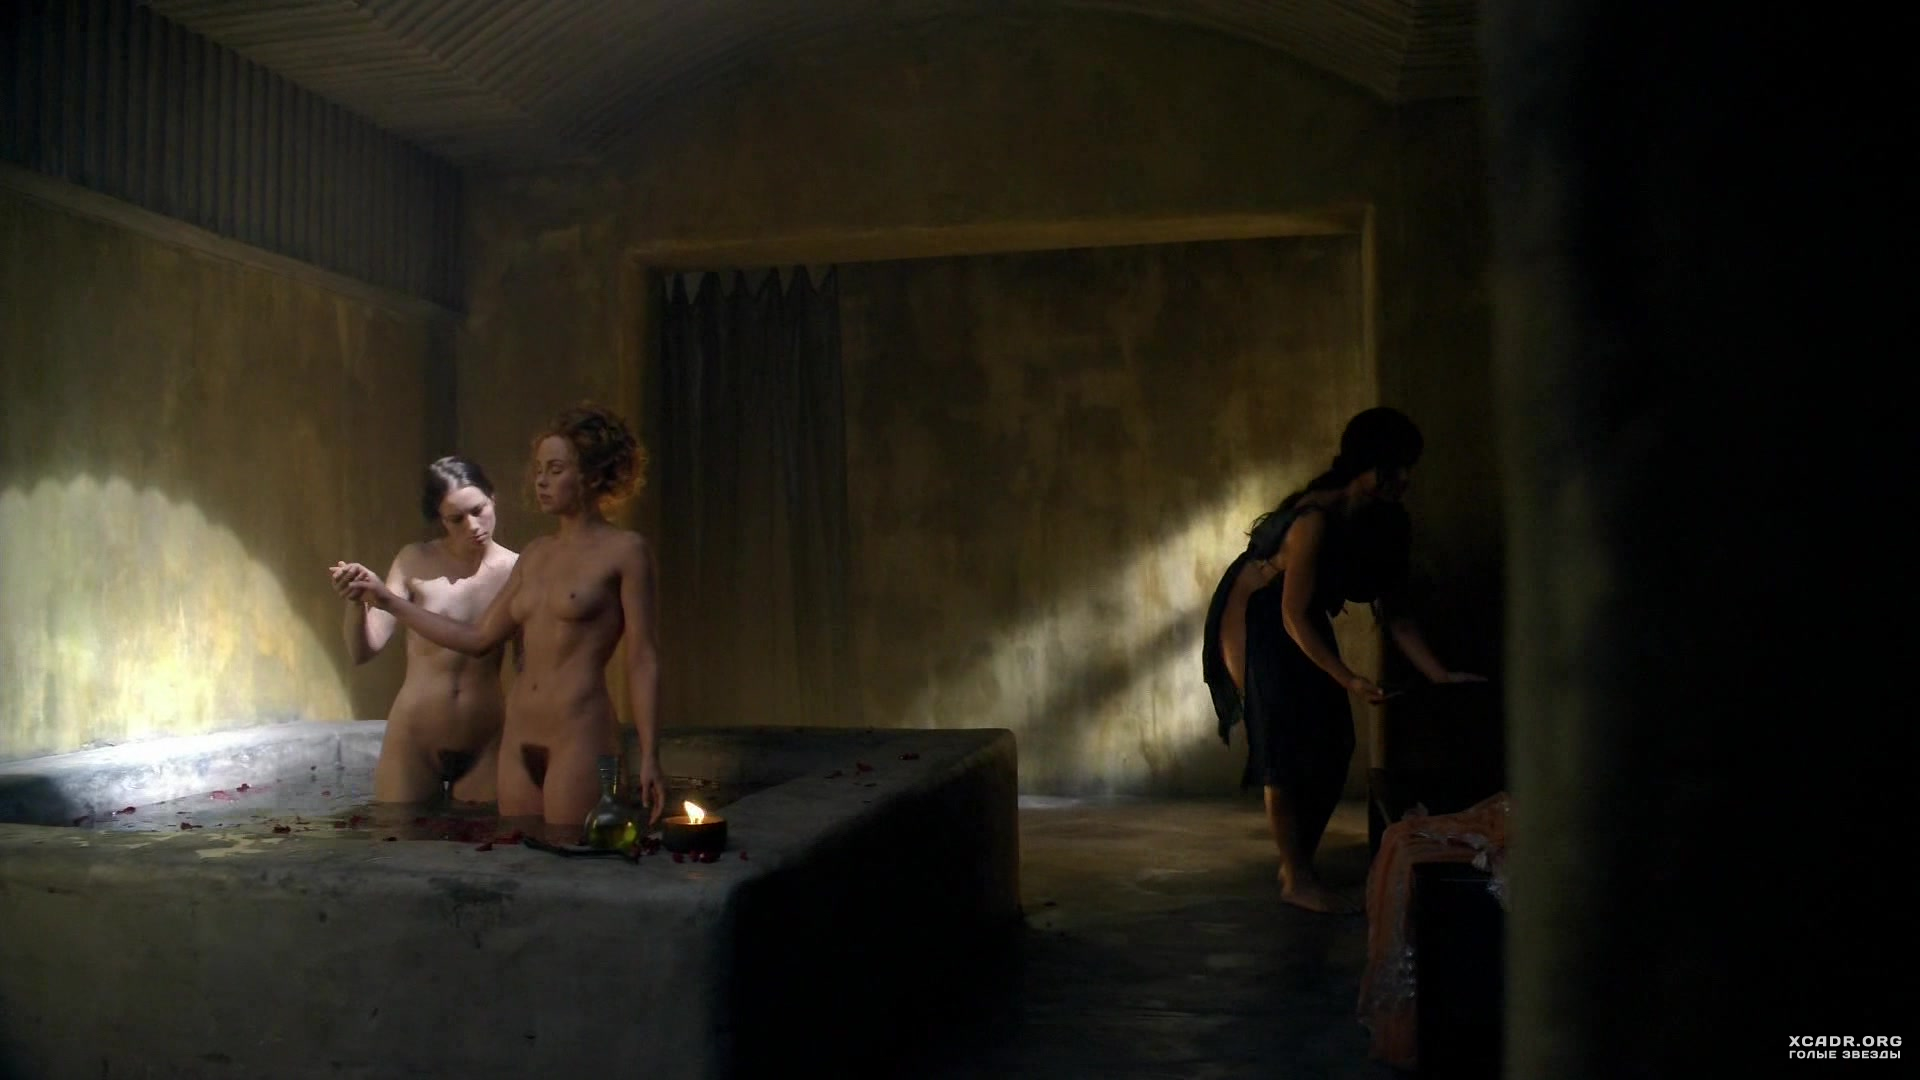 eroticheskie-foto-anni-samohinoy